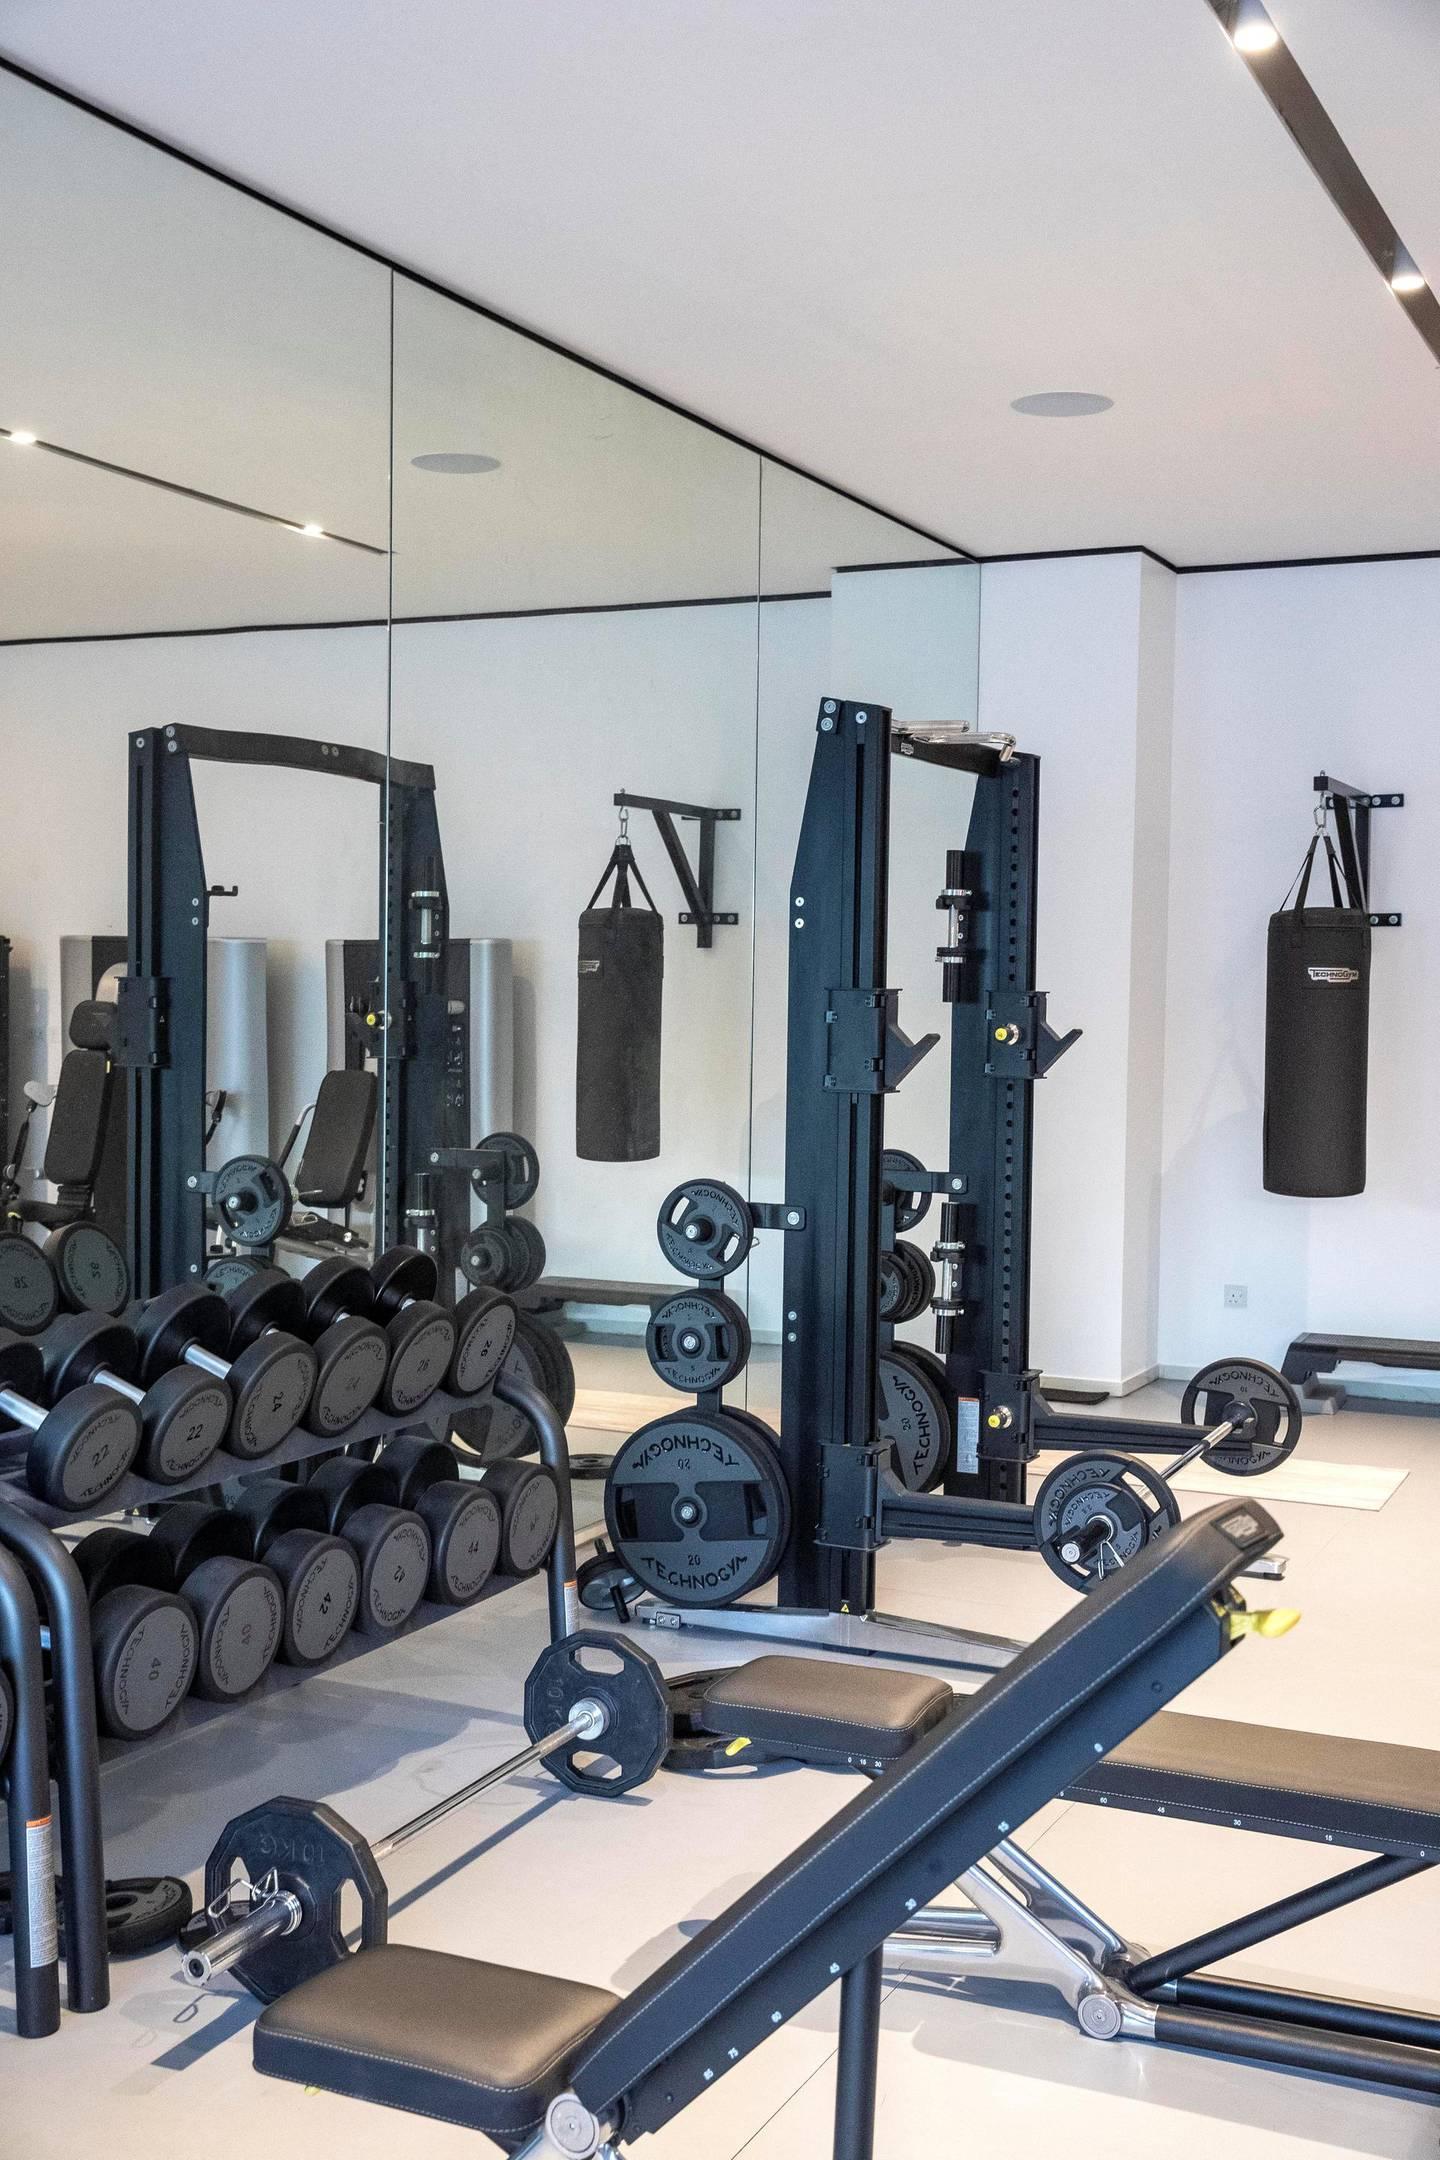 DUBAI, UNITED ARAB EMIRATES. 19 OCTOBER 2020. Rags Arora's home gym in Dubai. (Photo: Antonie Robertson/The National) Journalist: David Section: Luxury.